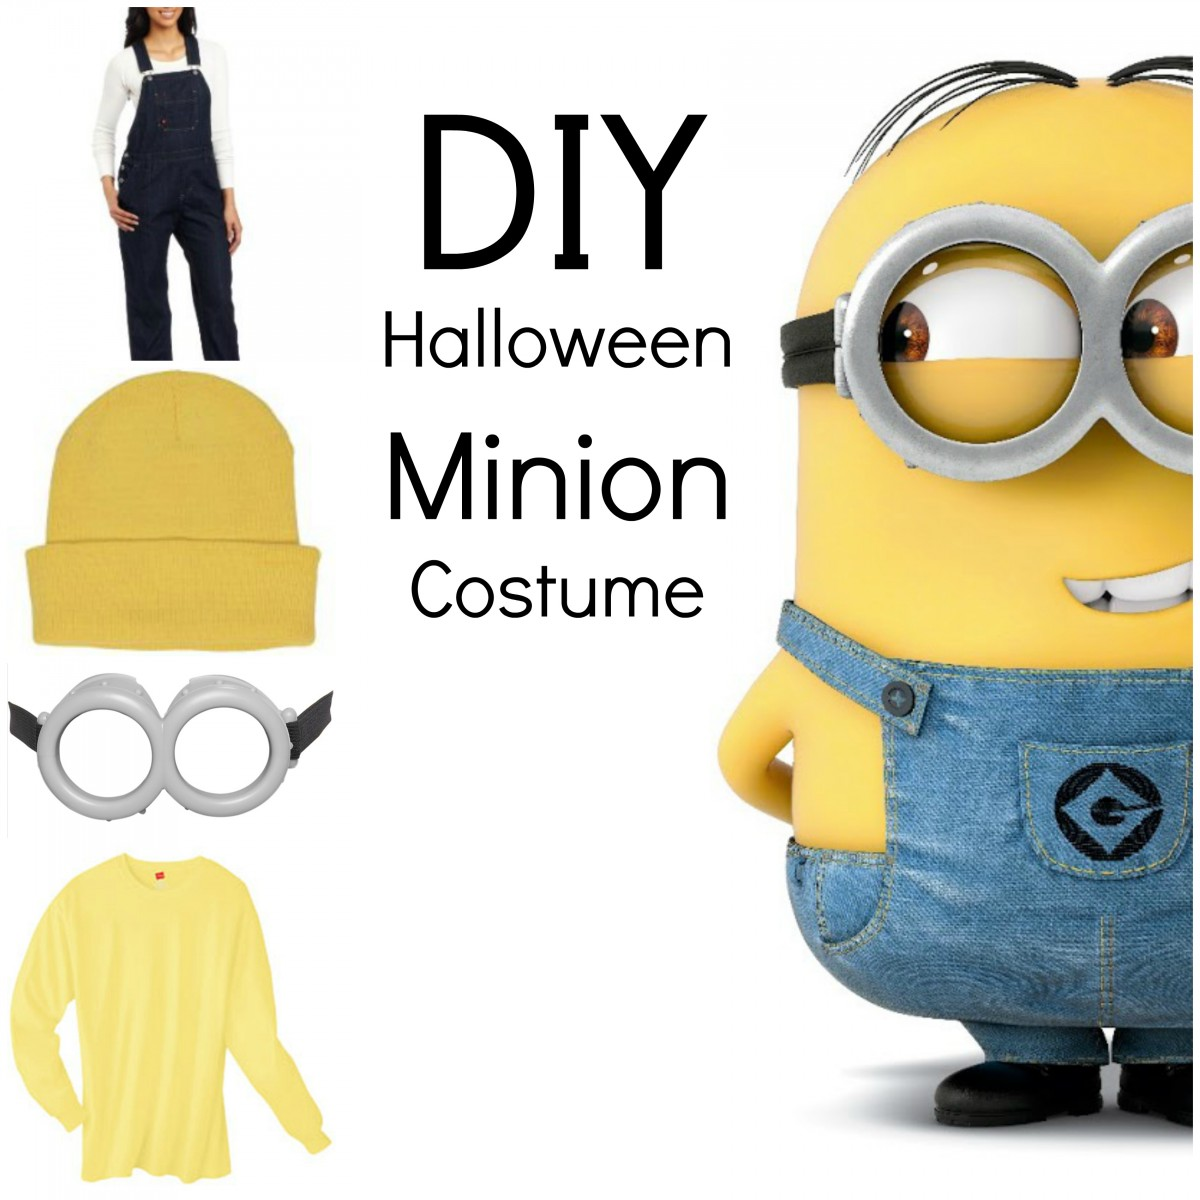 diy halloween minion costume her heartland soul  sc 1 st  Her Heartland Soul & DIY Halloween Minion Costume - Her Heartland Soul